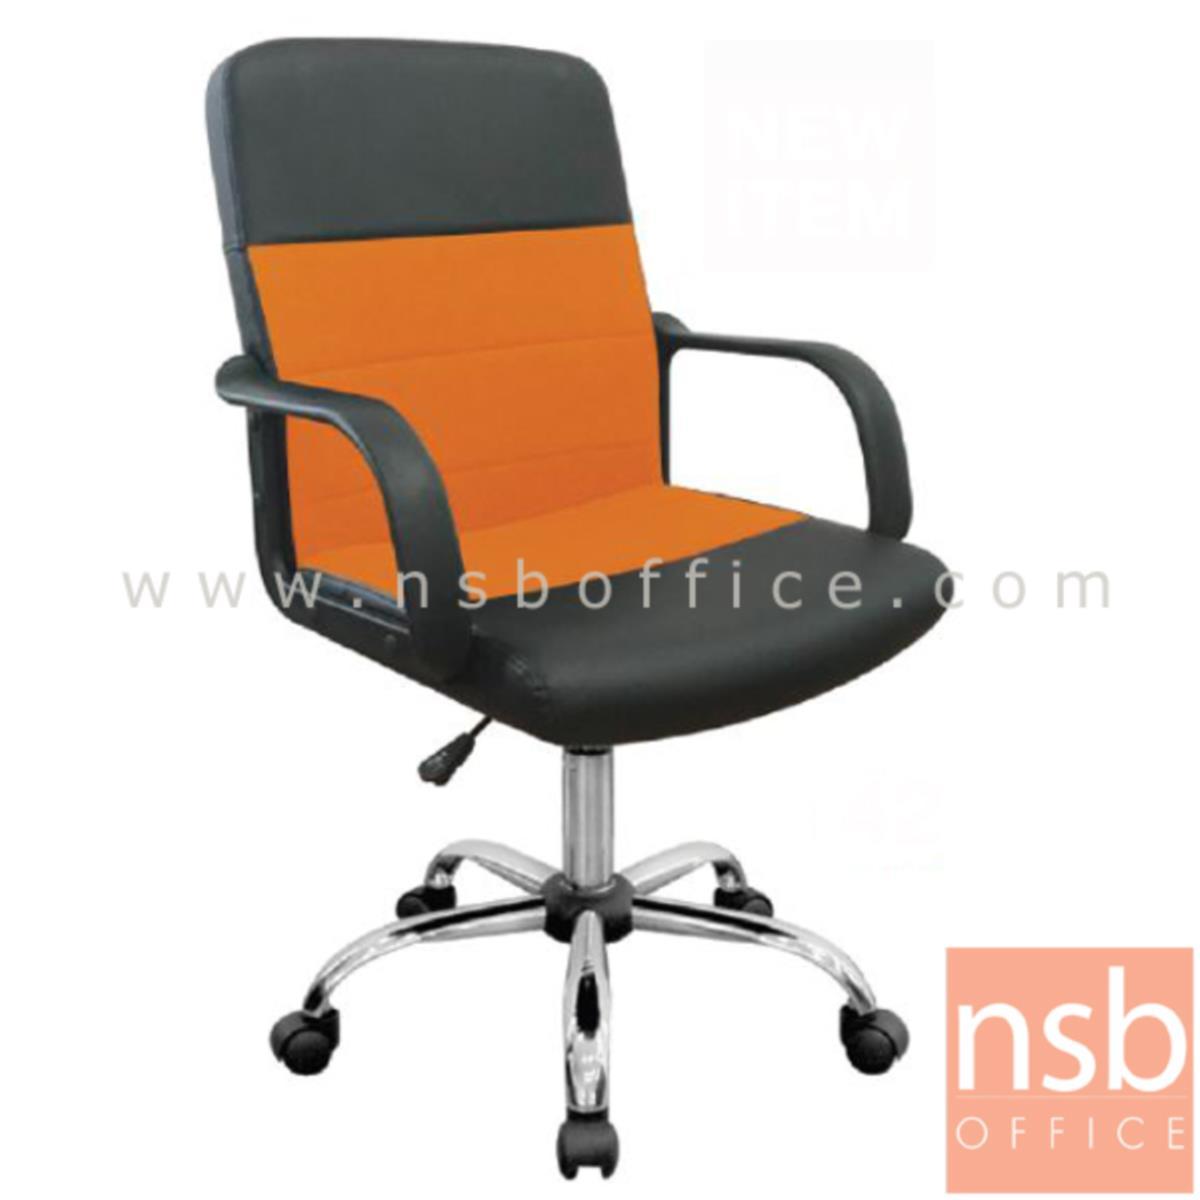 B24A204:เก้าอี้สำนักงาน รุ่น Brownberry  โช๊คแก๊ส ขาเหล็กชุบโครเมี่ยม